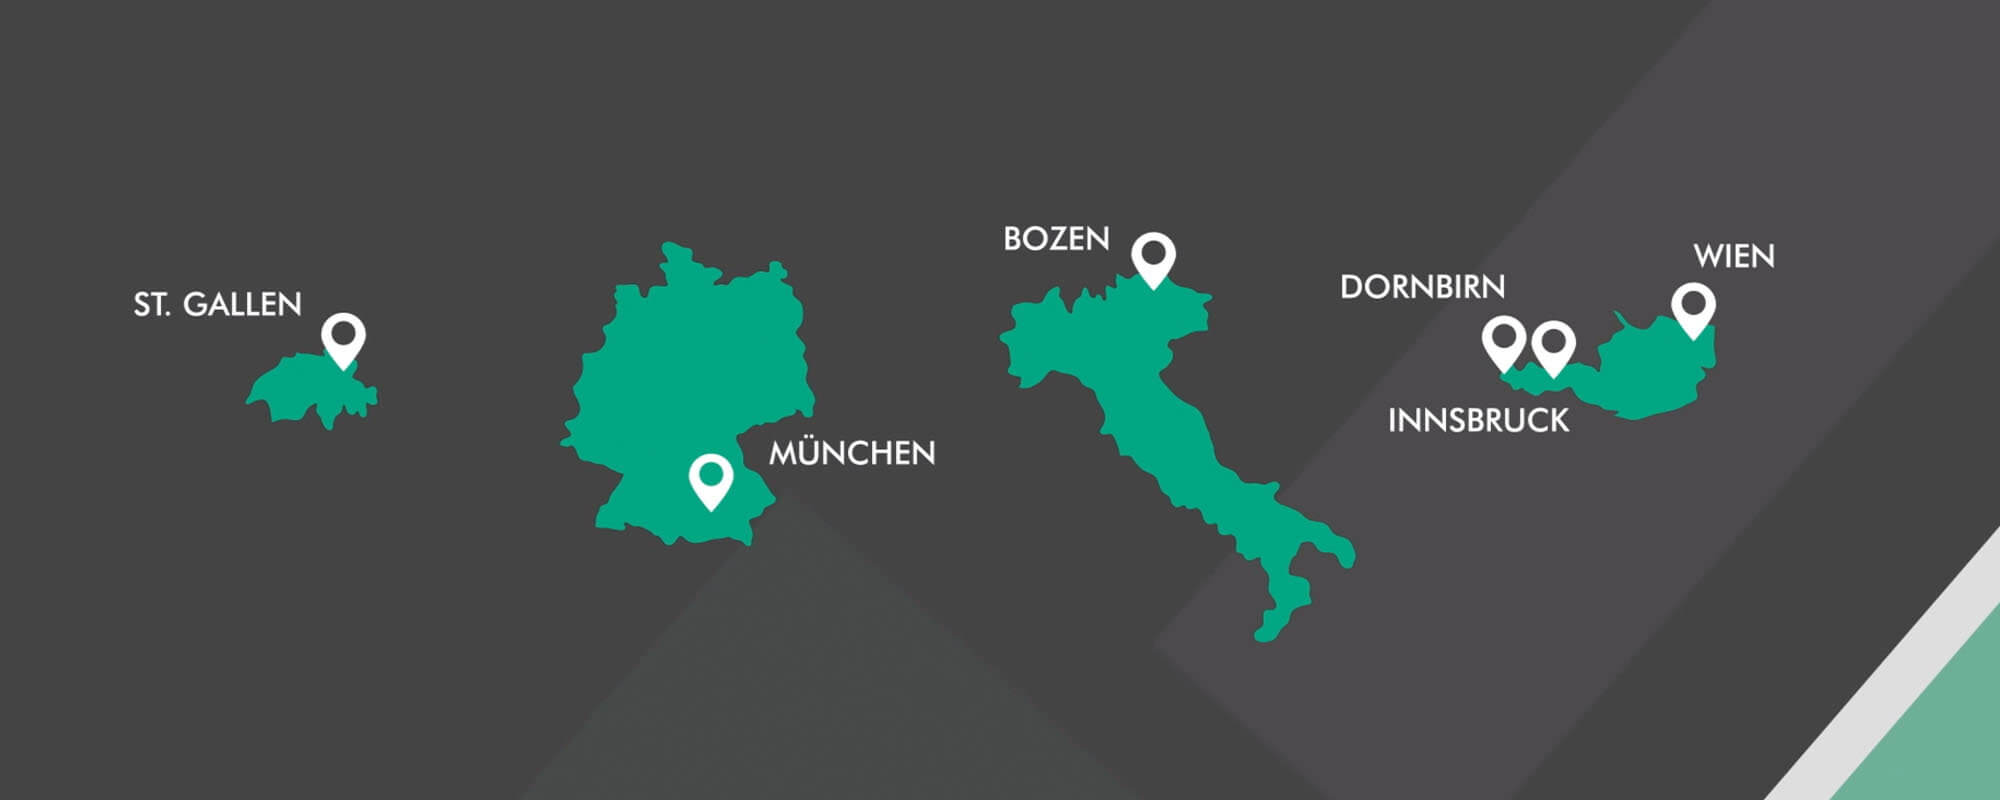 Zima, Immobilien, Videos, Projekte, Augsburg, München, Wien,